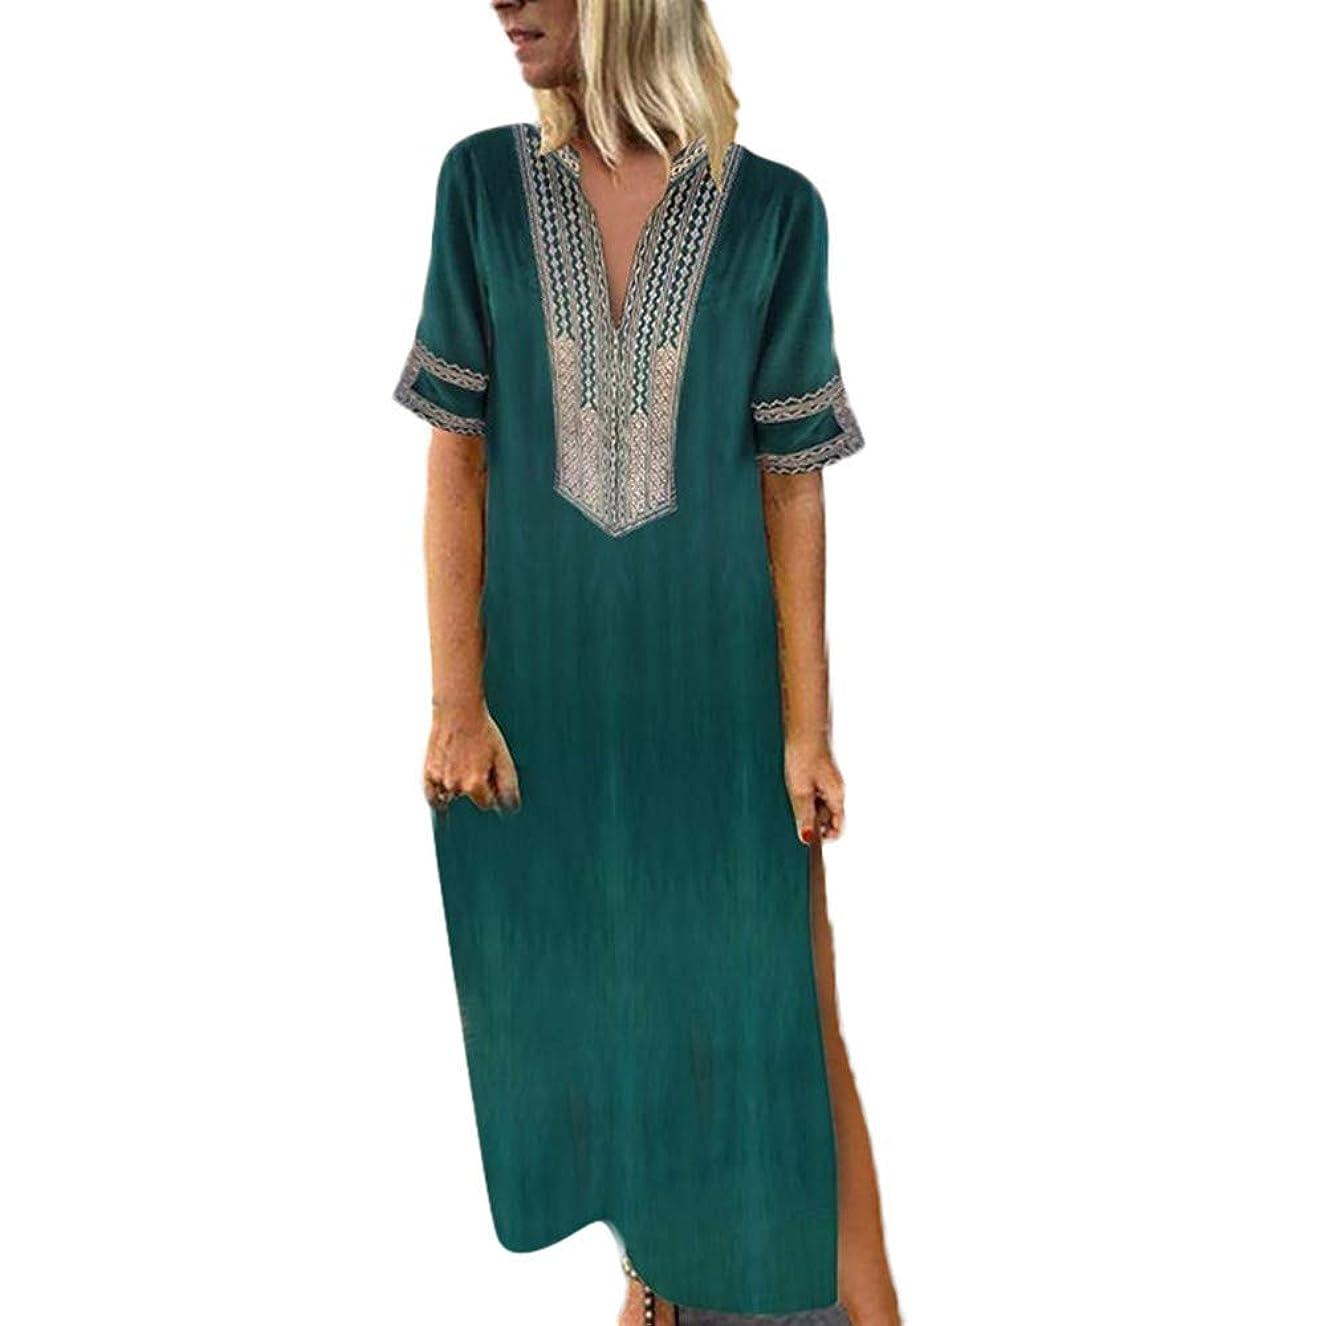 Hosamtel Women Bohemian Dress Short Sleeve V-Neck Floral Print Sexy Casual Vintage Summer Maxi Split Dresses Sundress czqchkasho9439